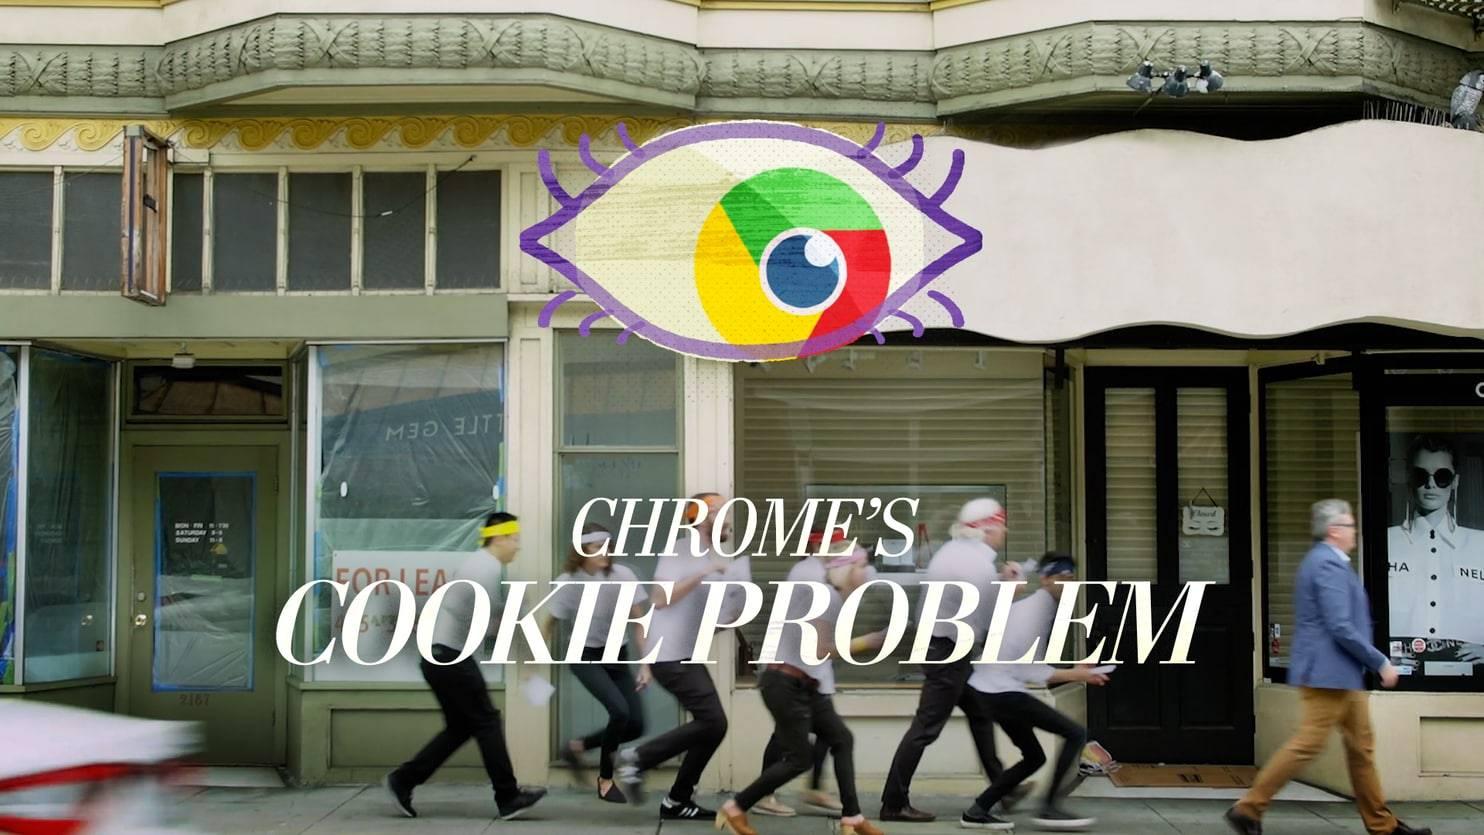 Has Google Chrome become surveillance software? Time to